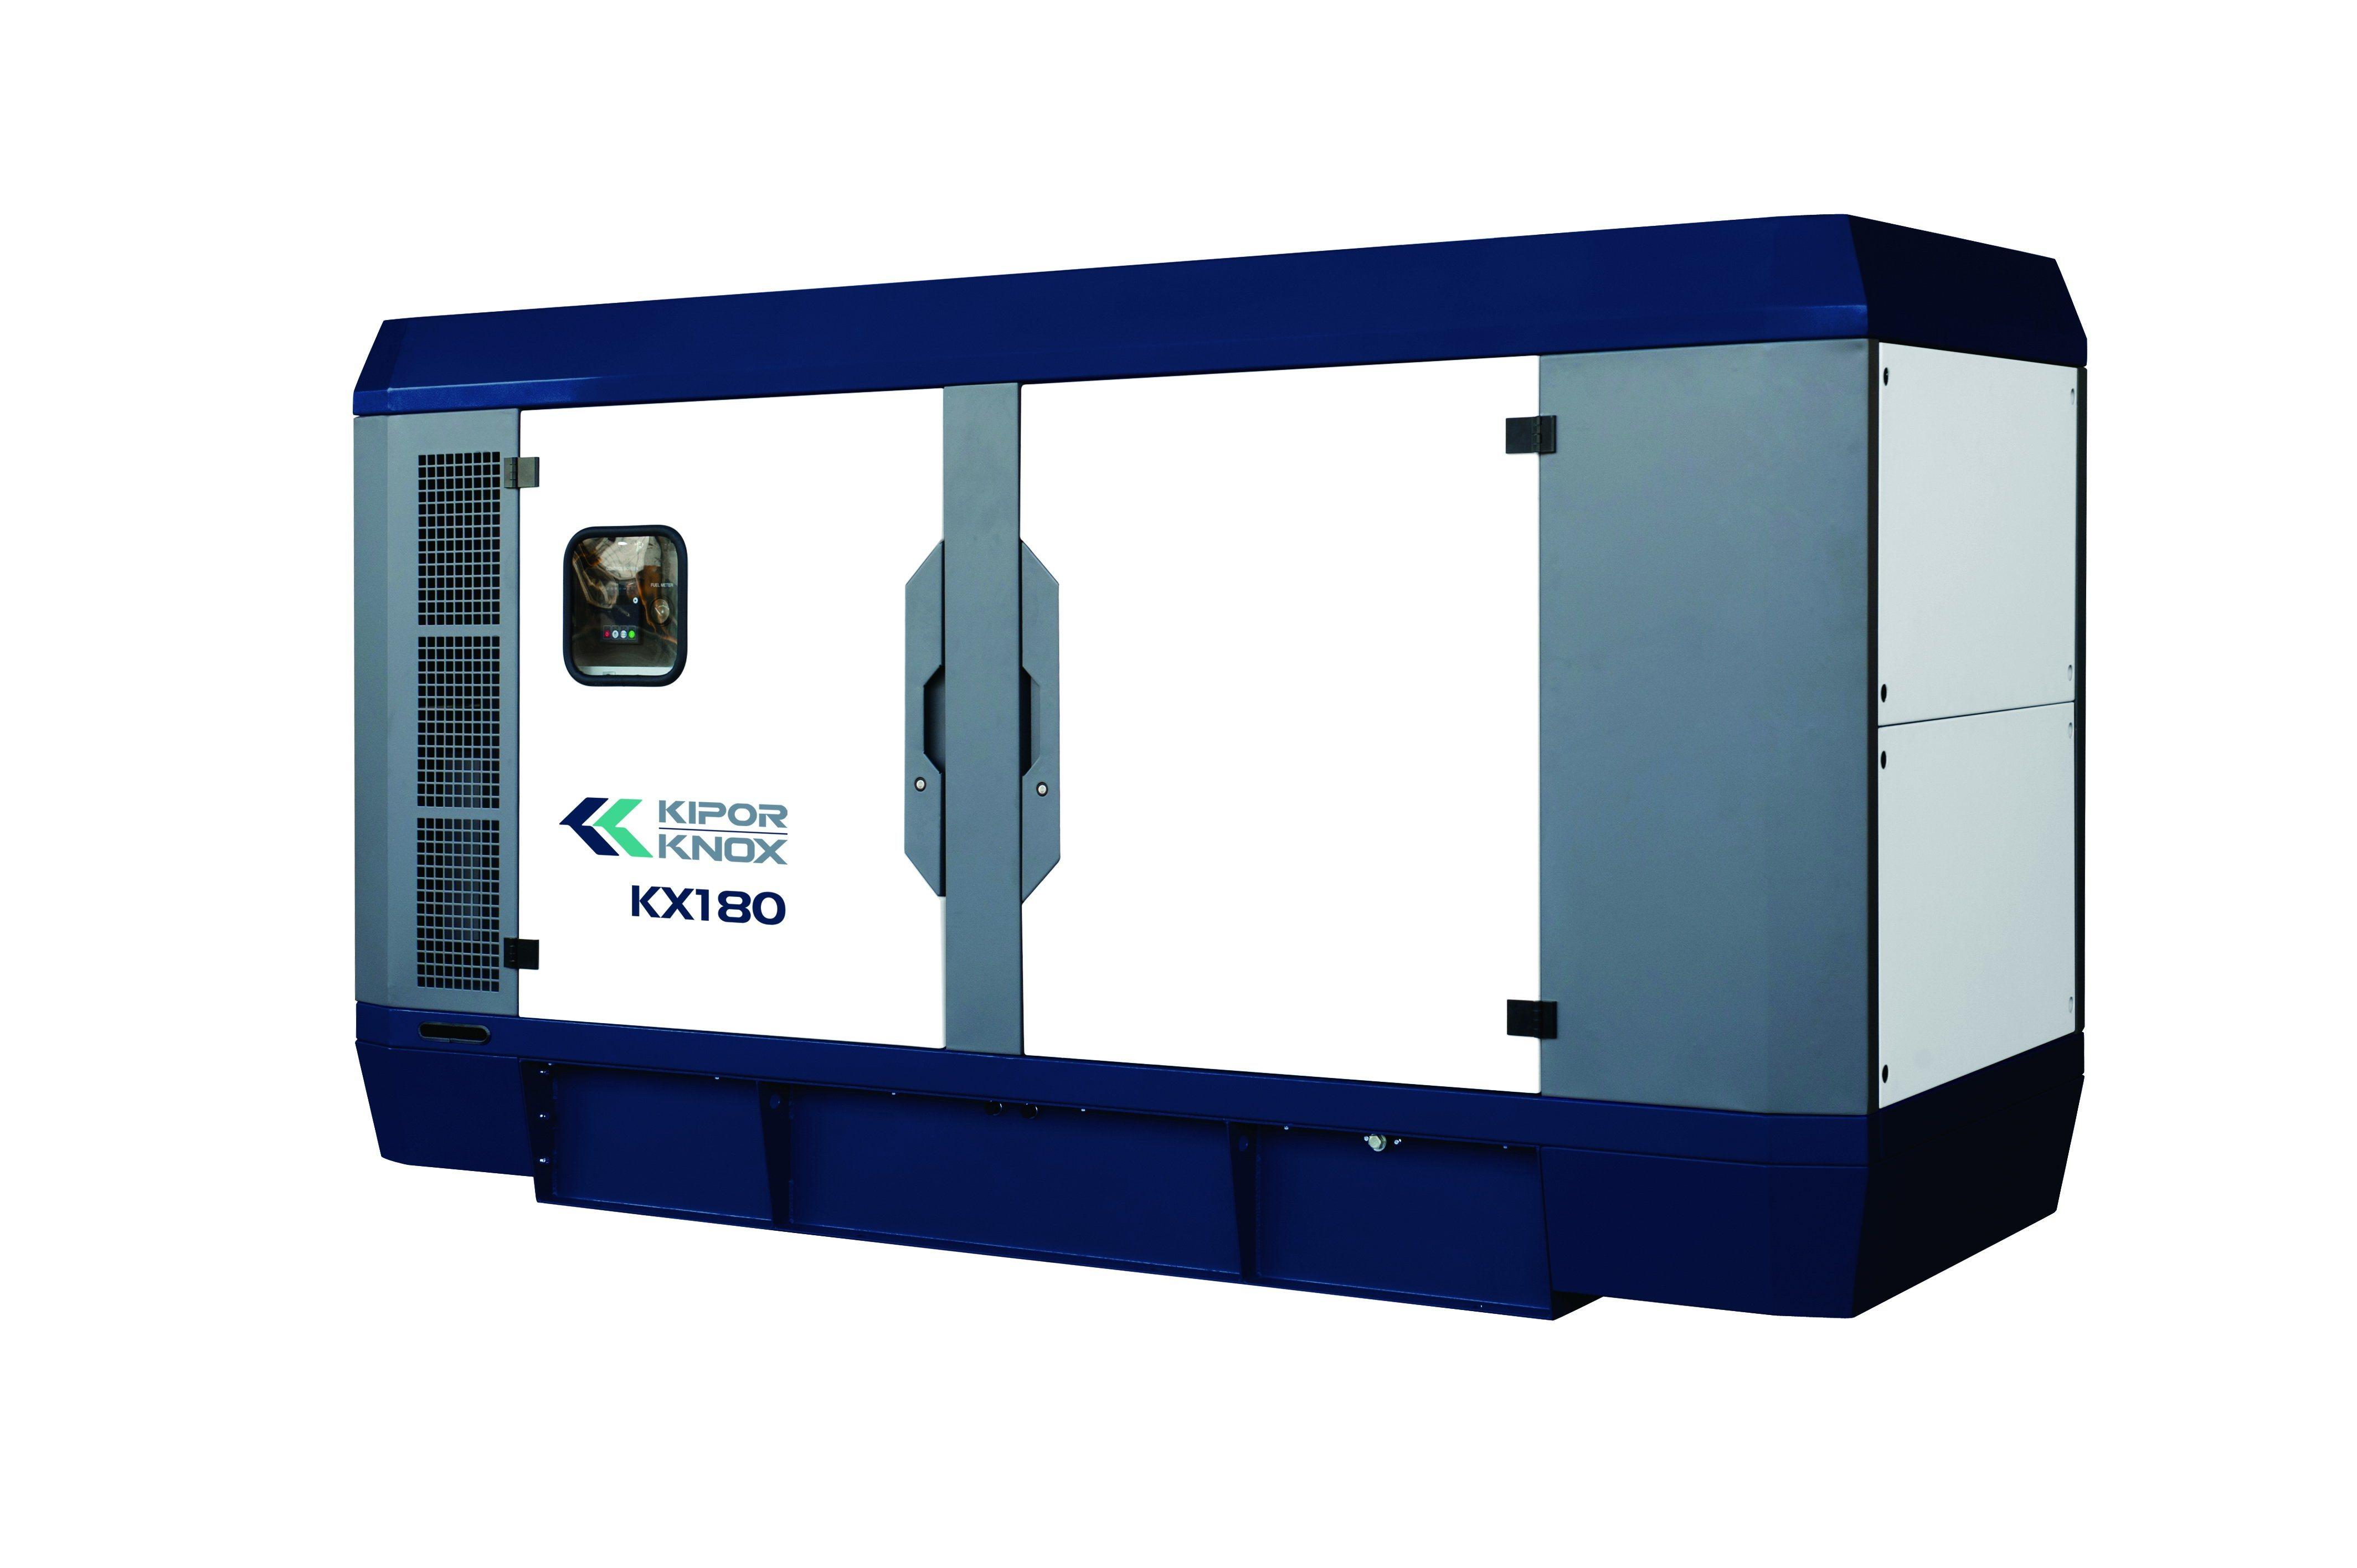 Kipor Knox 120kw Prime Power Silent Power Generator Kx180 with Kipor Engine